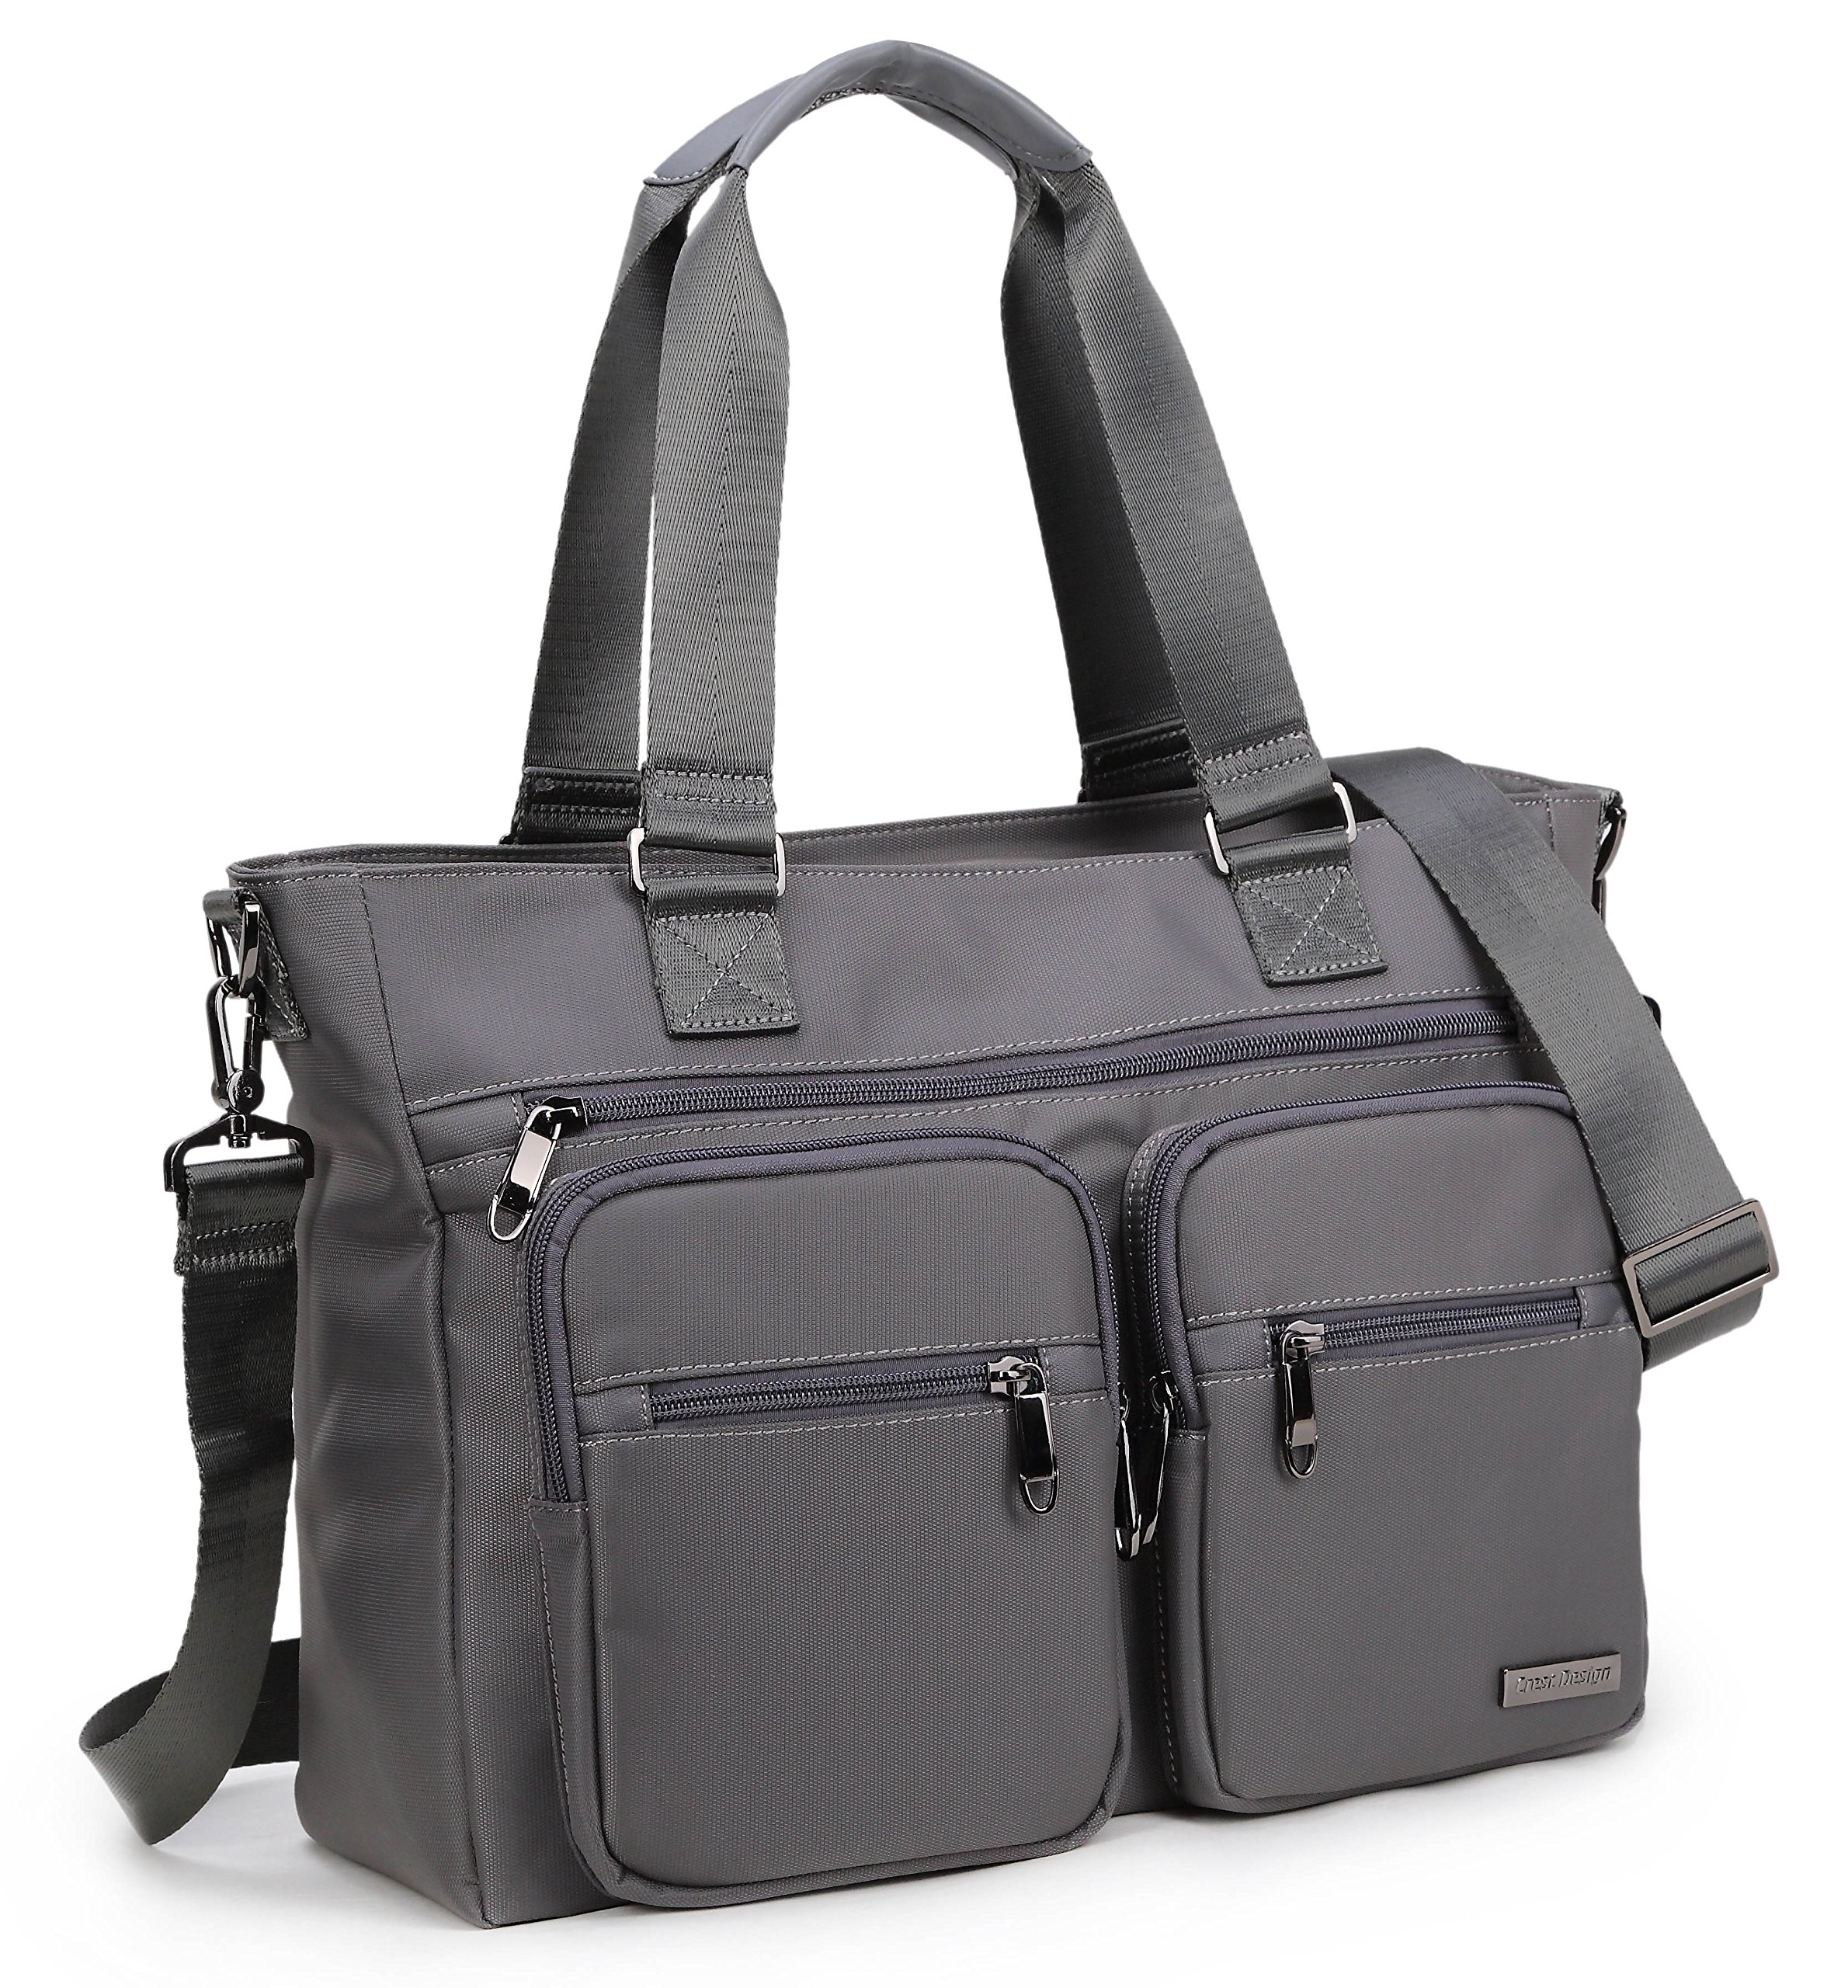 Crest Design Water Repellent Nylon Shoulder Bag Handbag Tablet Laptop Tote as Travel Work and School Bag. Perfect Nursing Tote to Carry Medical, Nursing Supplies (Charcoal)